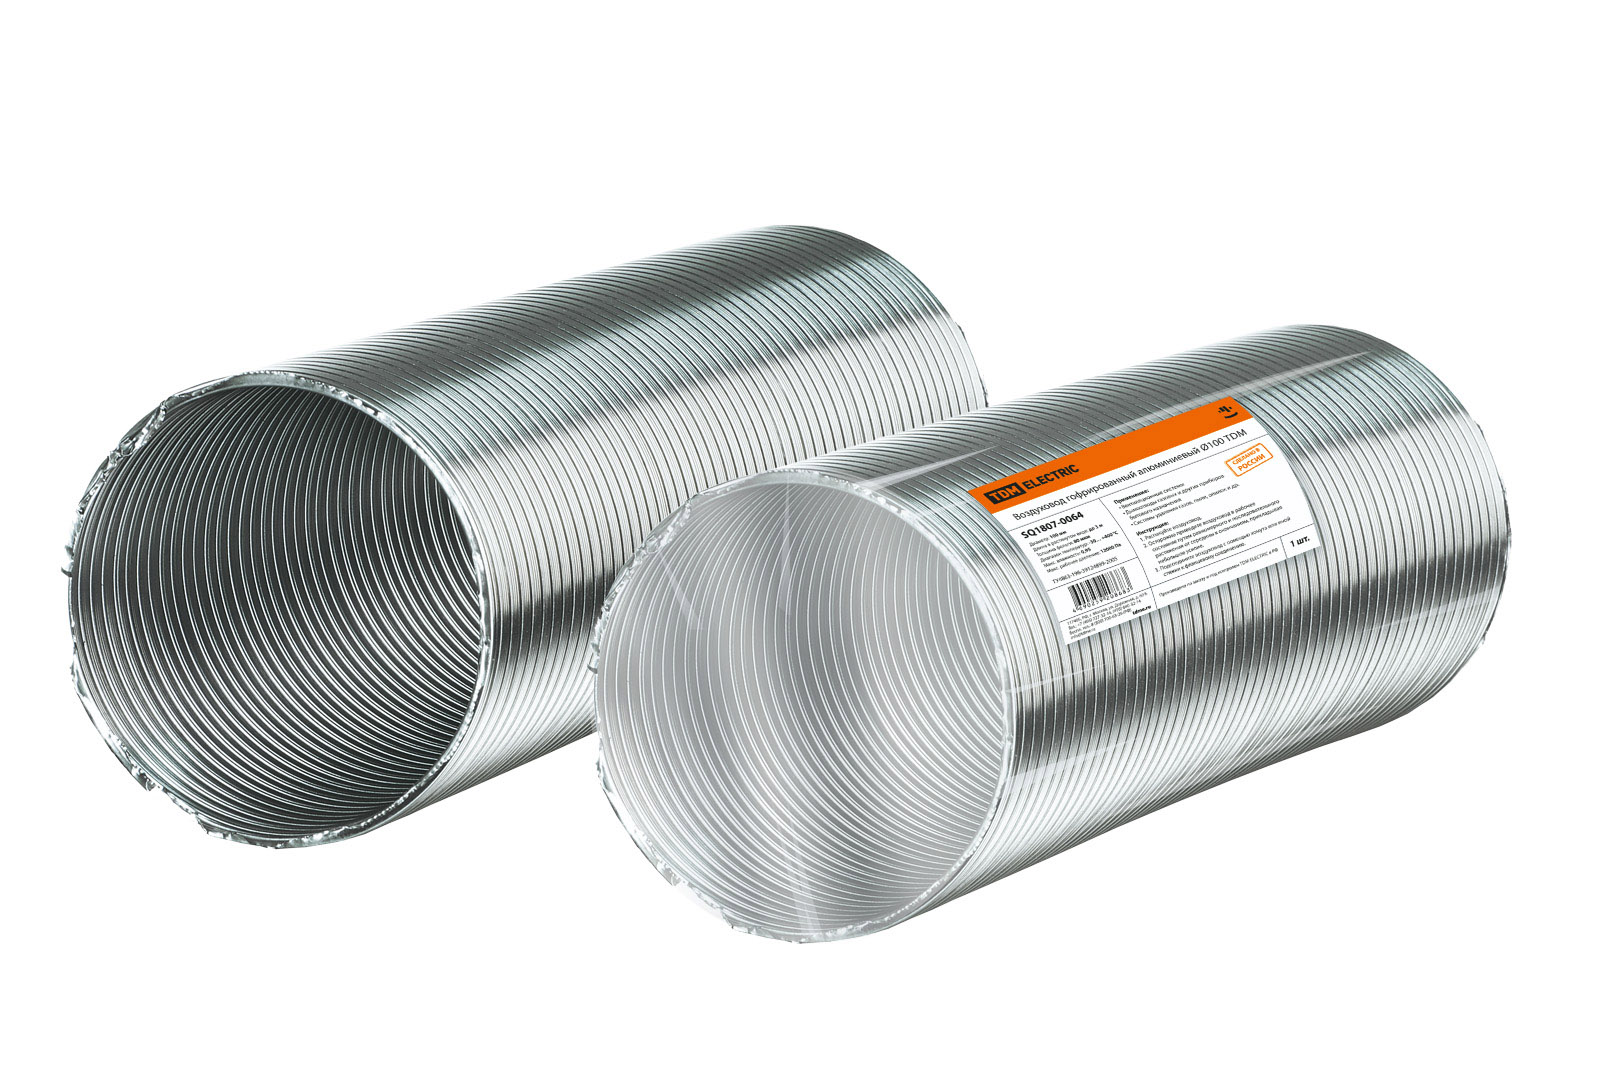 Воздуховод ТДМВоздуховоды (климат)<br>Тип: воздуховод, Тип воздуховода: гибкий, Материал: алюминий, Форма: круглая, Диаметр: 100, Мин. длина: 0.6, Макс. длина: 3<br>